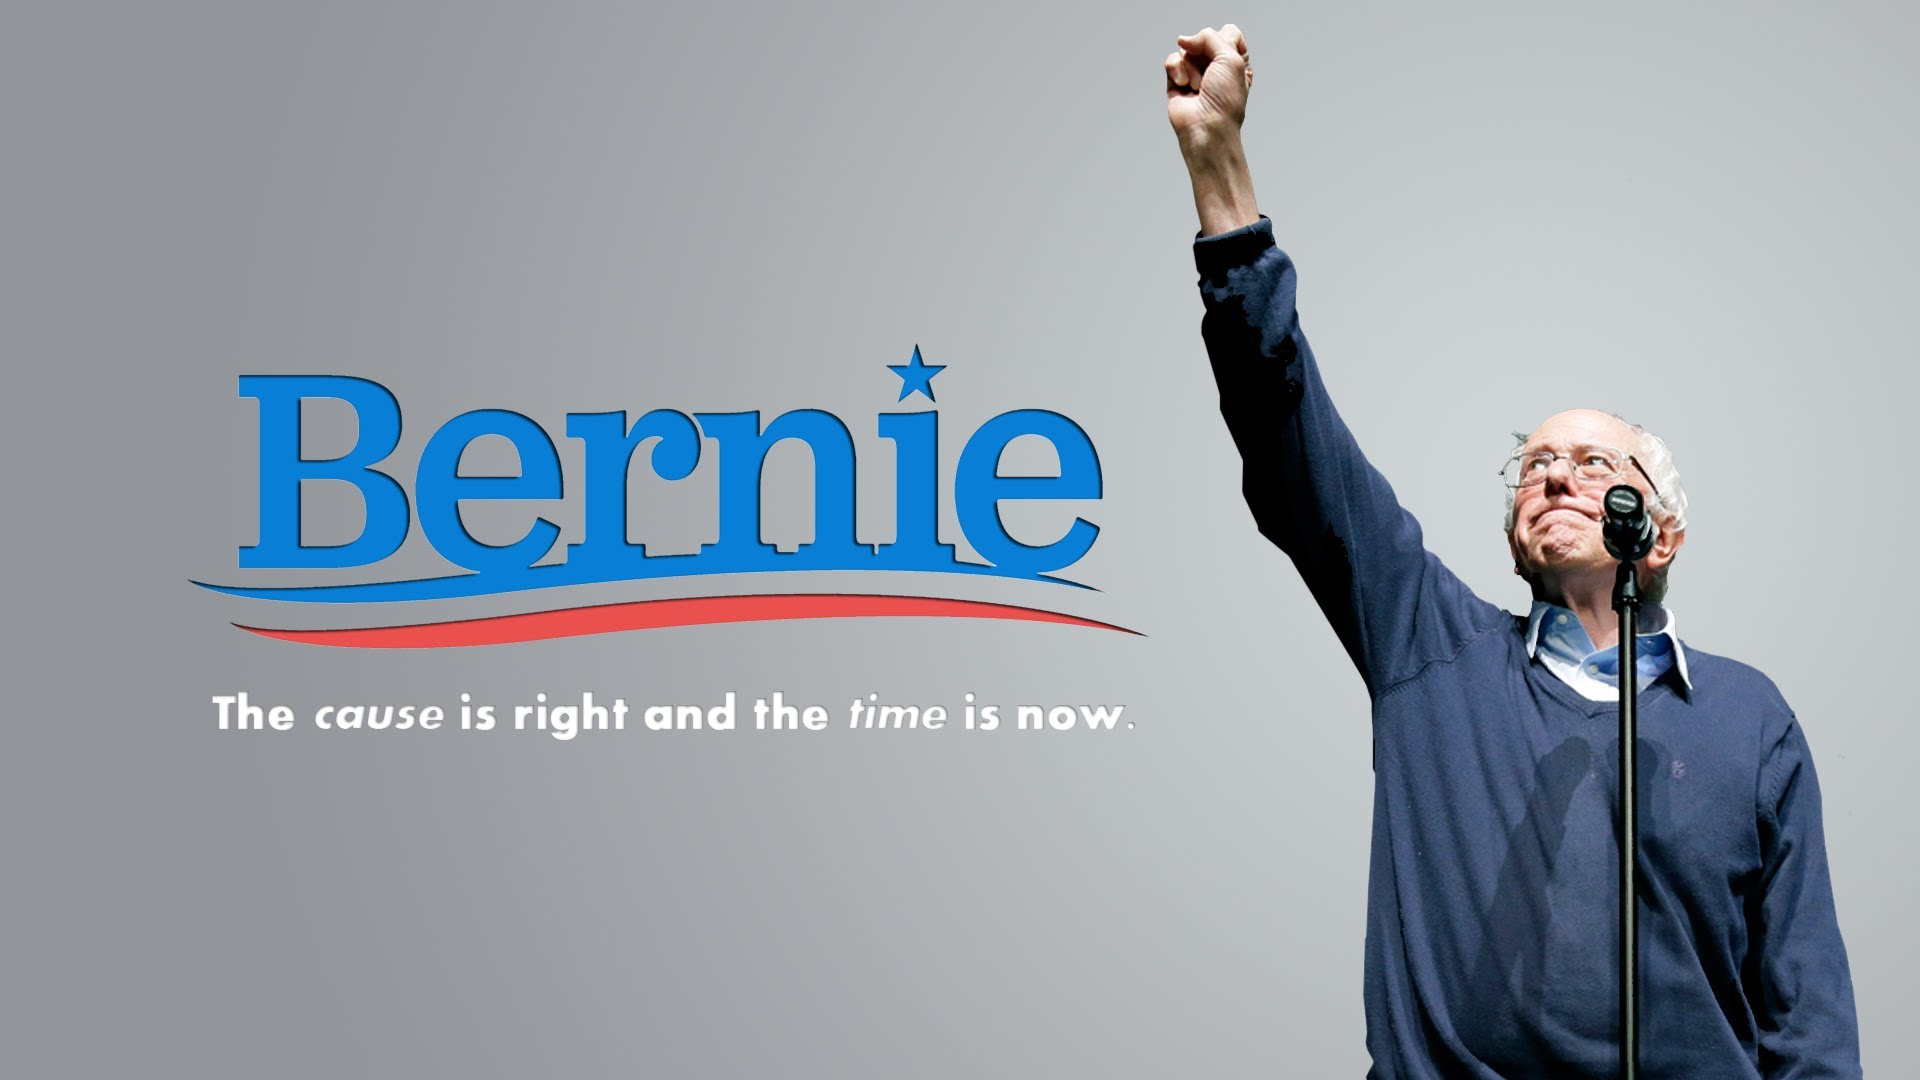 Bernie Sanders Wallpaper Download: LIVE : Bernie Sanders (D) Delivers Remarks At Watch Party